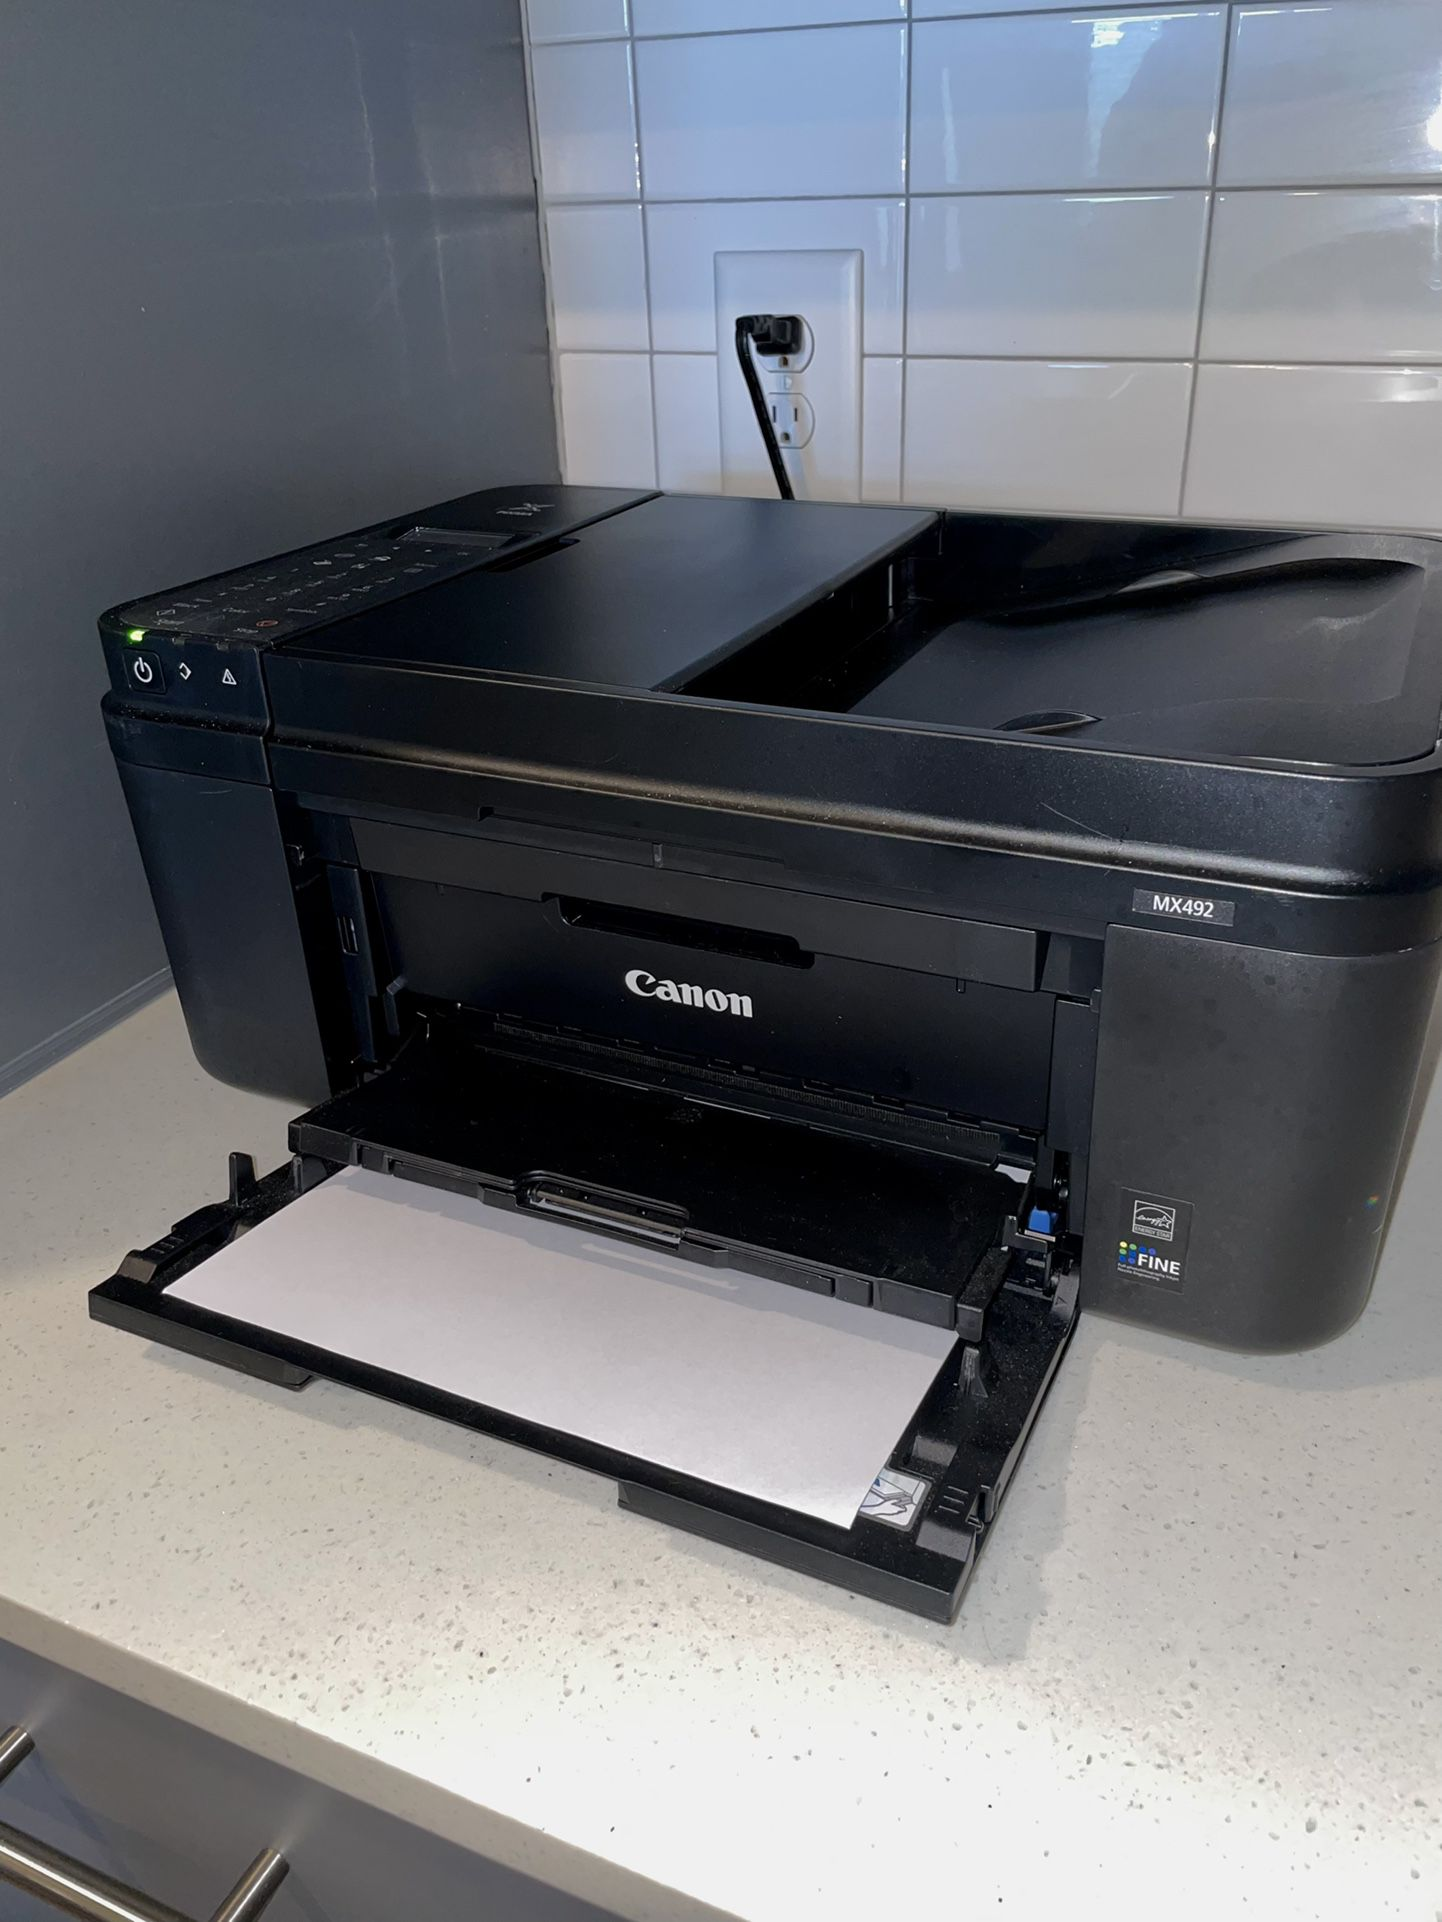 Cannon printer/scanner/fax/copy